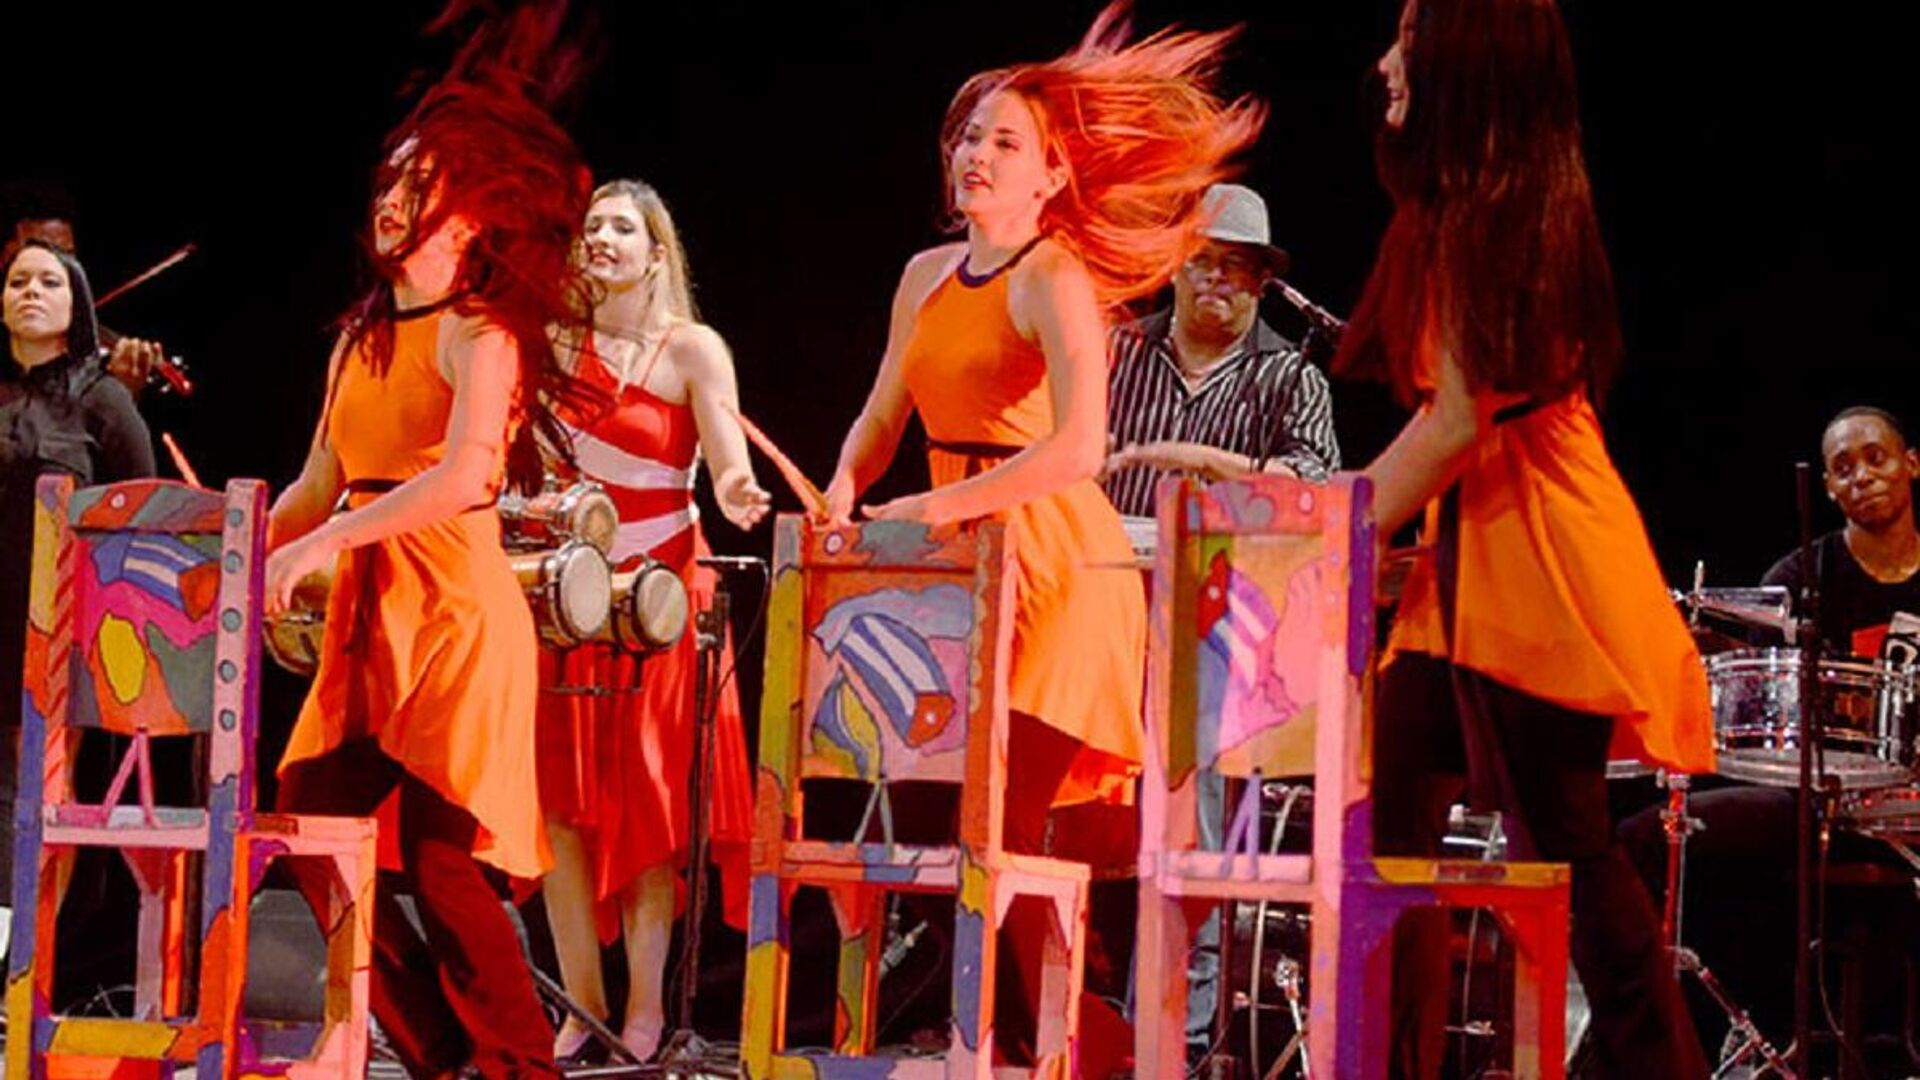 Compañía de baile Habana Compás Dance - Sputnik Mundo, 1920, 08.06.2021